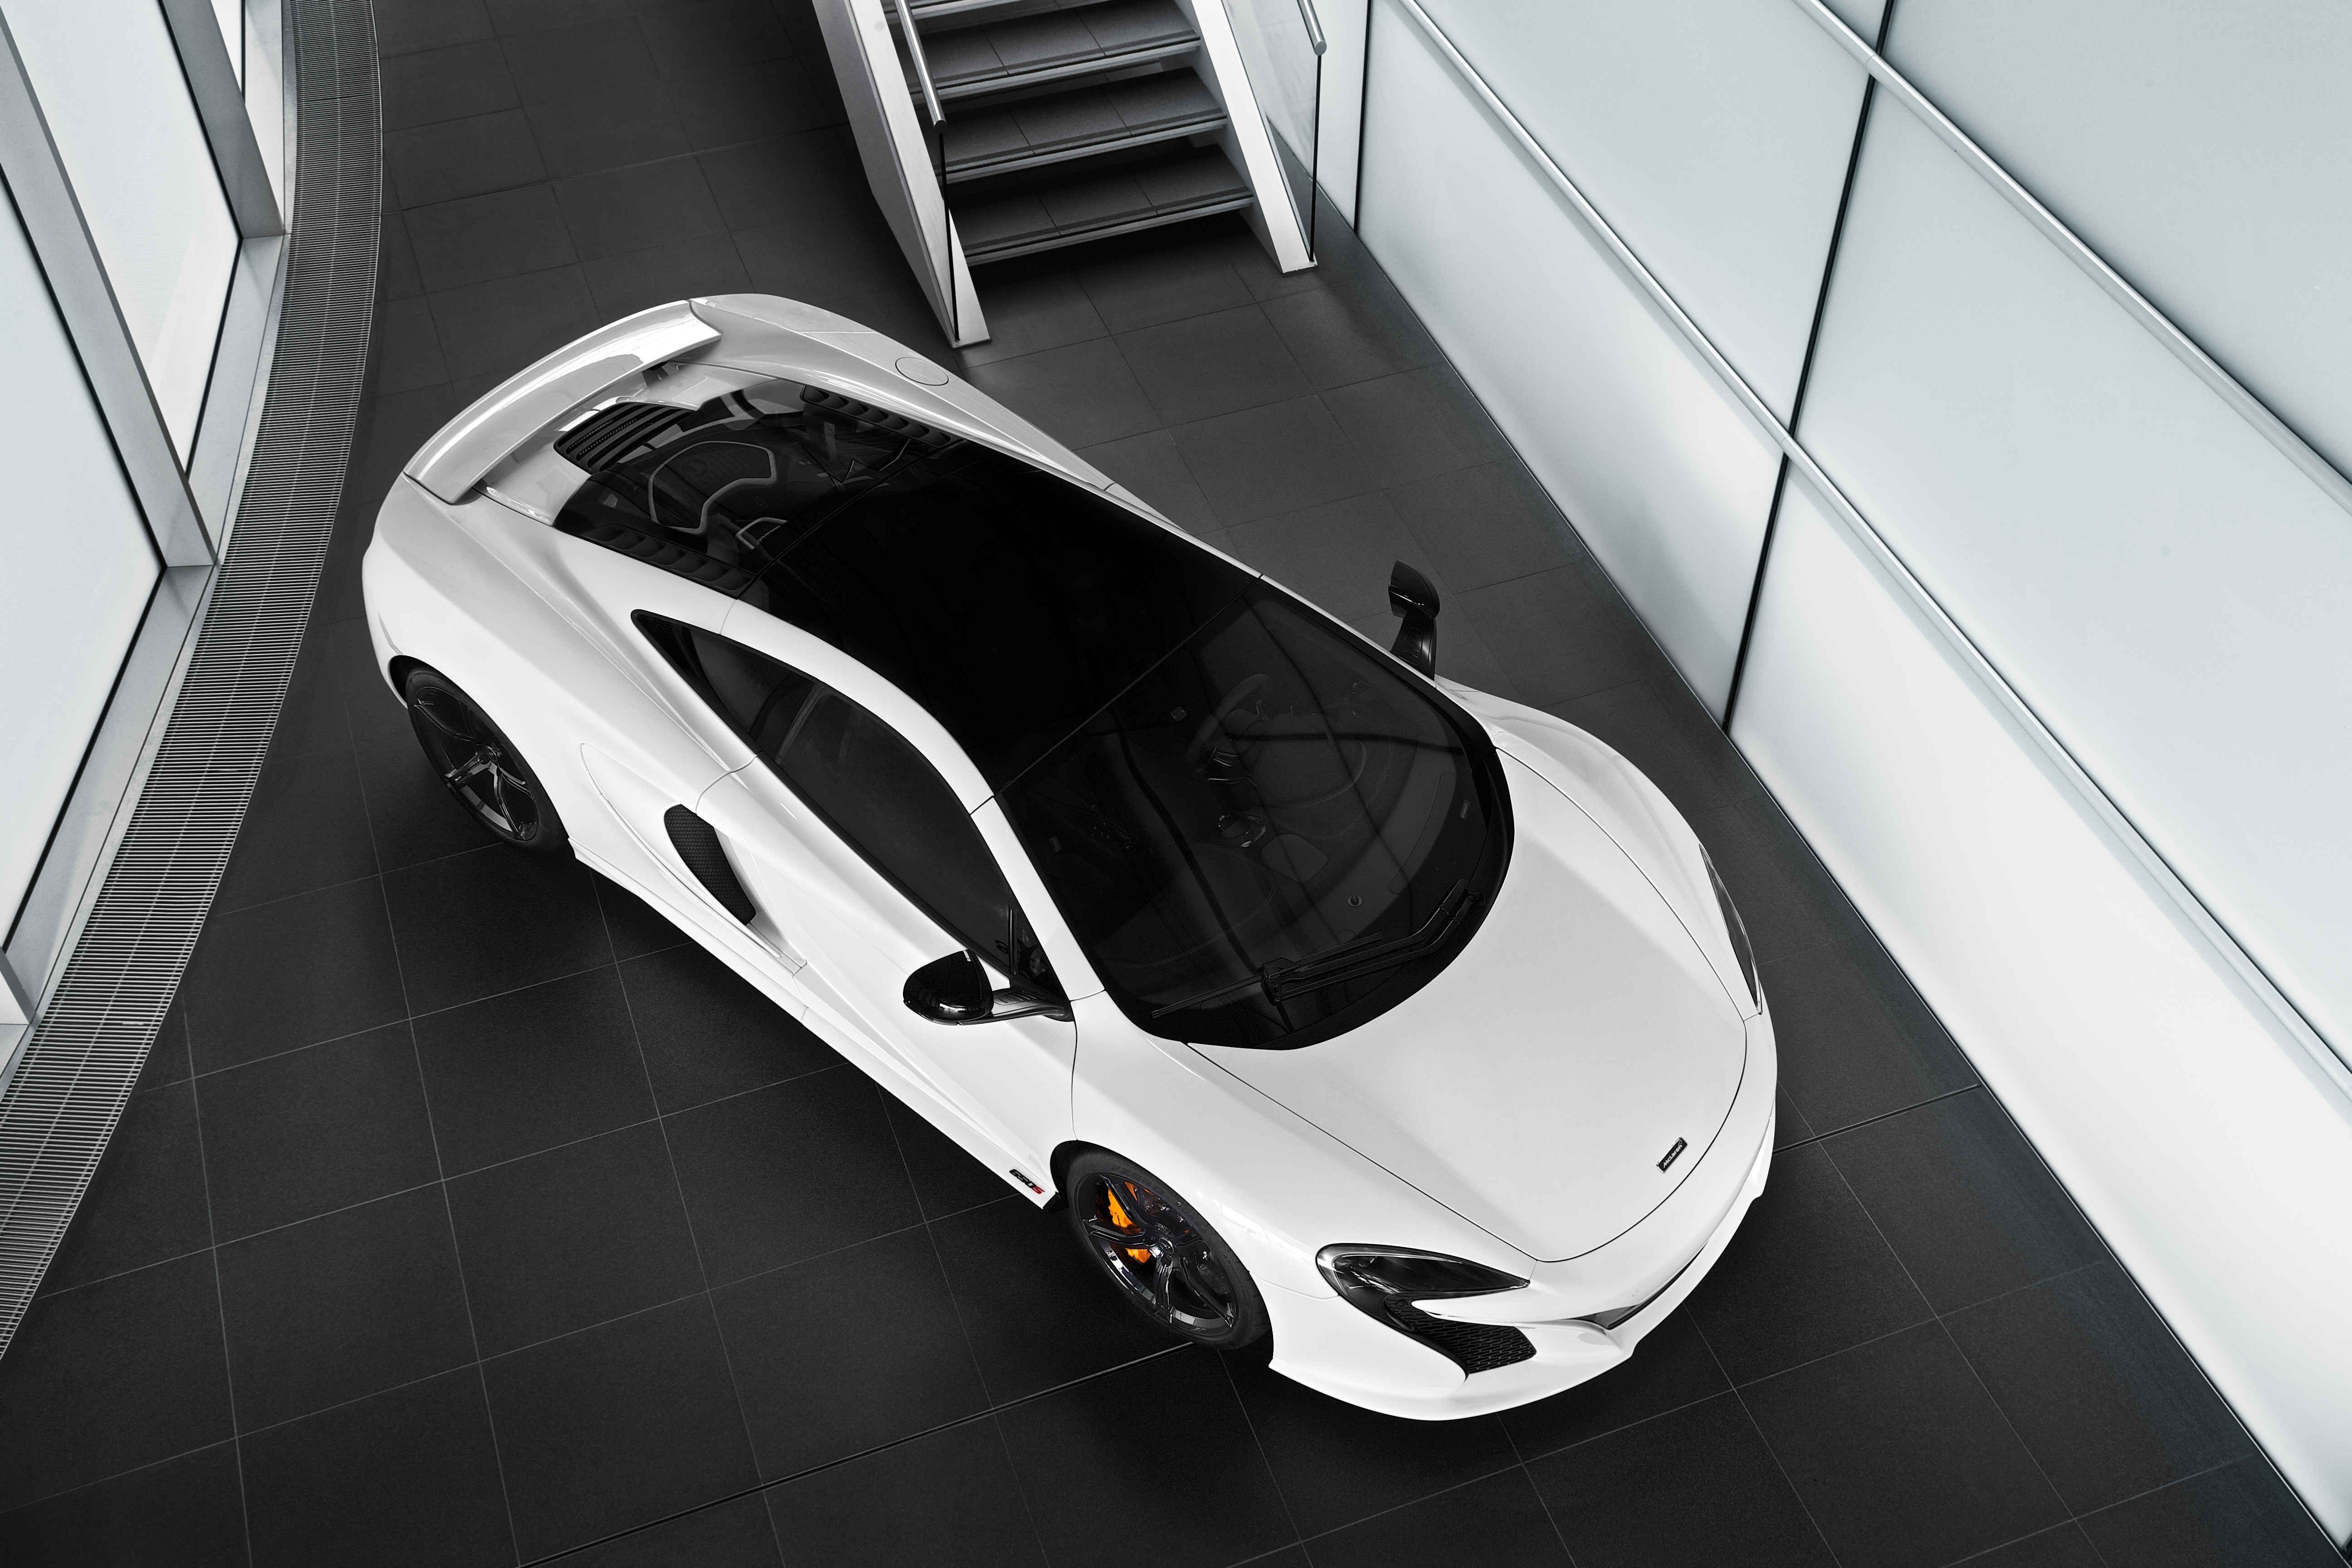 https://s1.cdn.autoevolution.com/images/news/gallery/mclaren-p1-gtr-racecar-is-one-step-closer-to-racing-photo-gallery_6.jpg